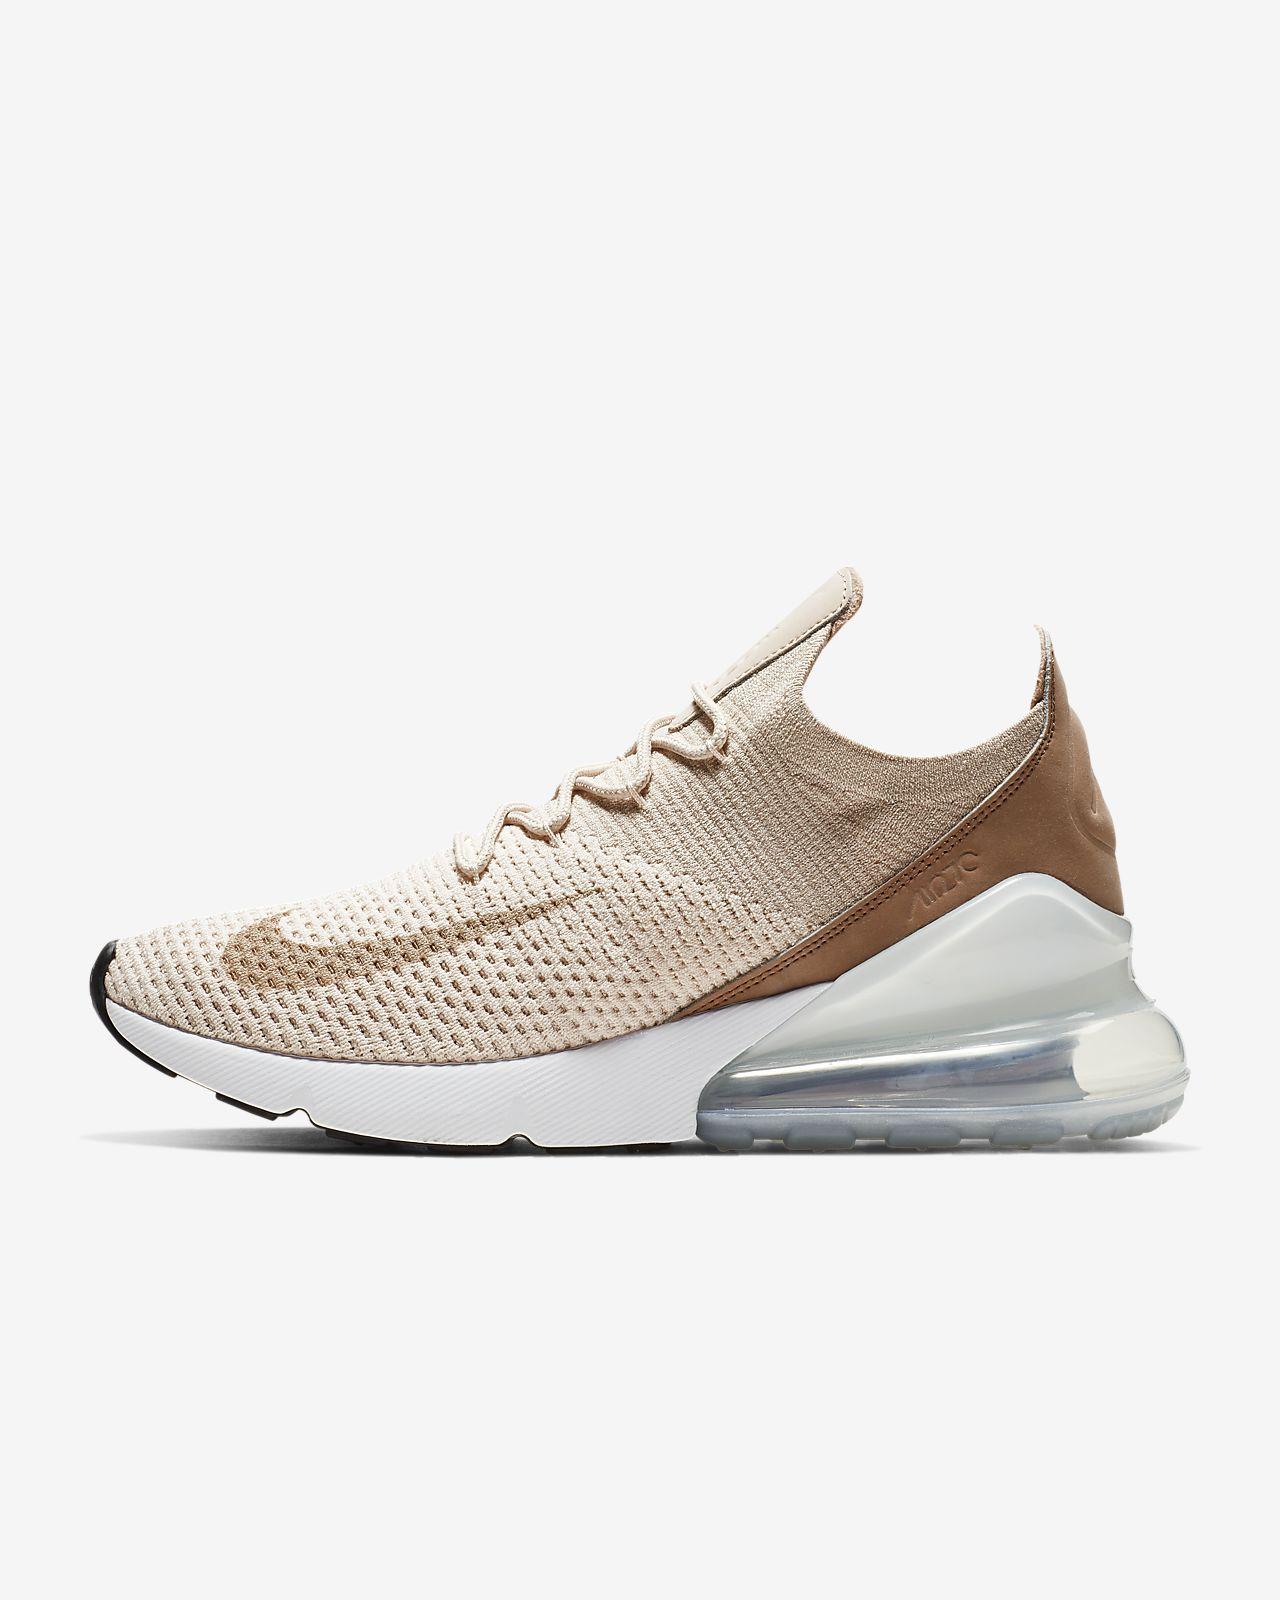 ... Nike Air Max 270 Flyknit Women s Shoe. Low Resolution undefined ce11ea648875b